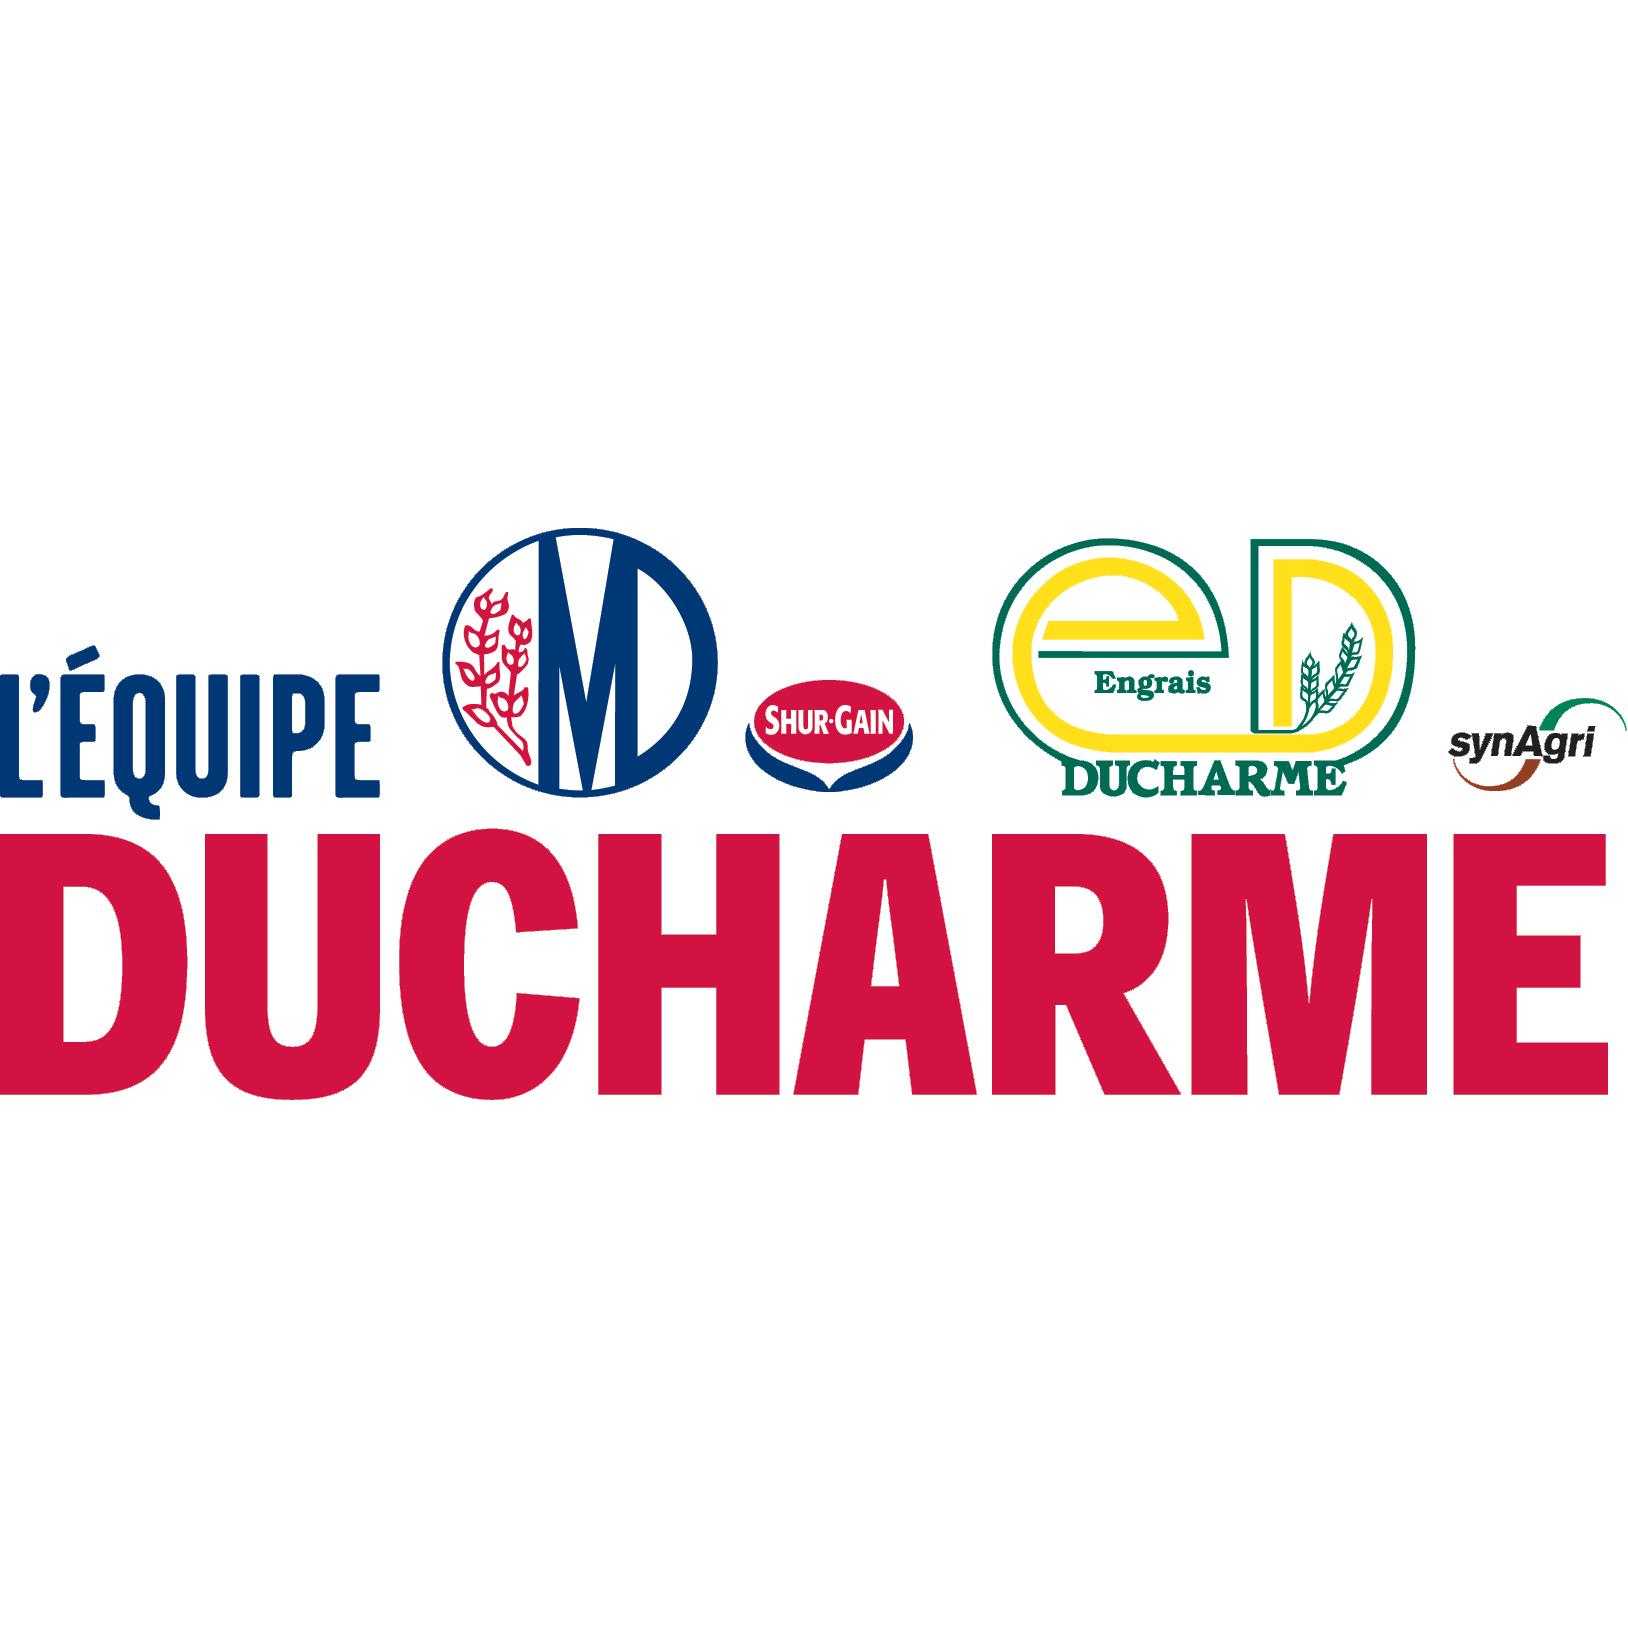 https://aqinac.com/wp-content/uploads/2019/11/Equipe_Ducharme_square.png